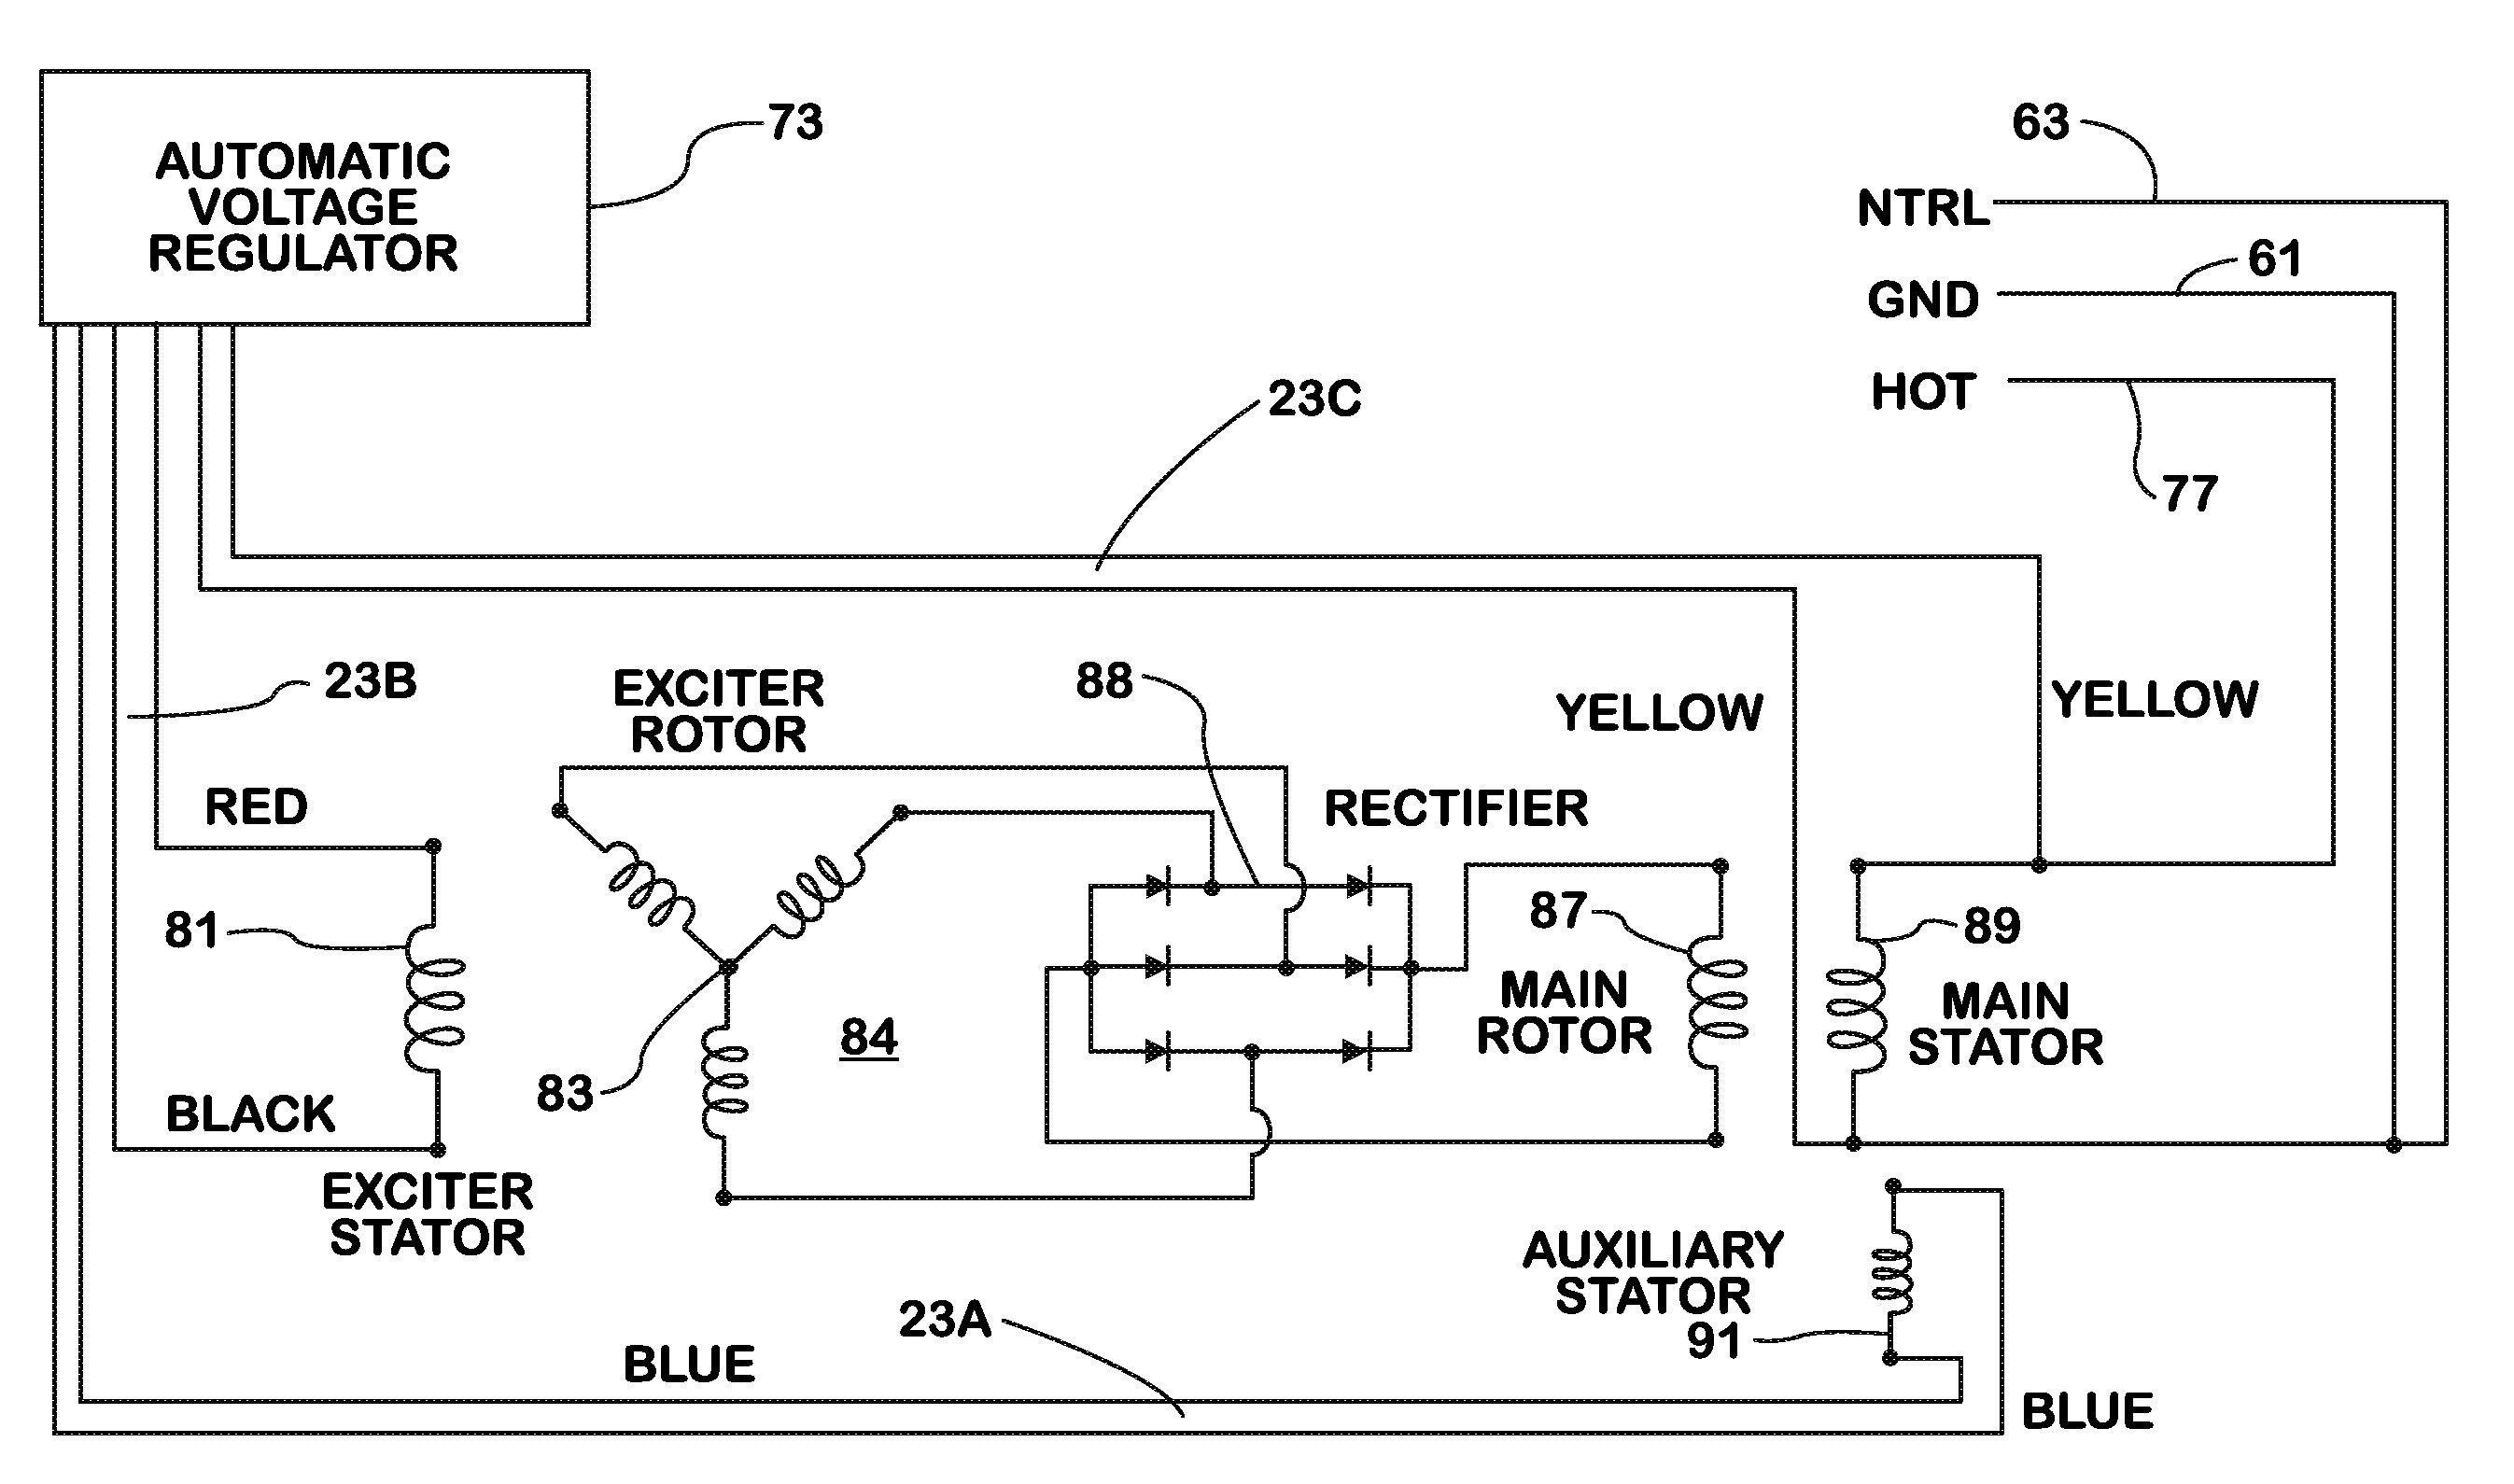 Luxury Wiring Diagram Of An Alternator Diagrams Digramssample Diagramimages Wiringdiagramsample Wiring Voltage Regulator Diagram Electrical Wiring Diagram